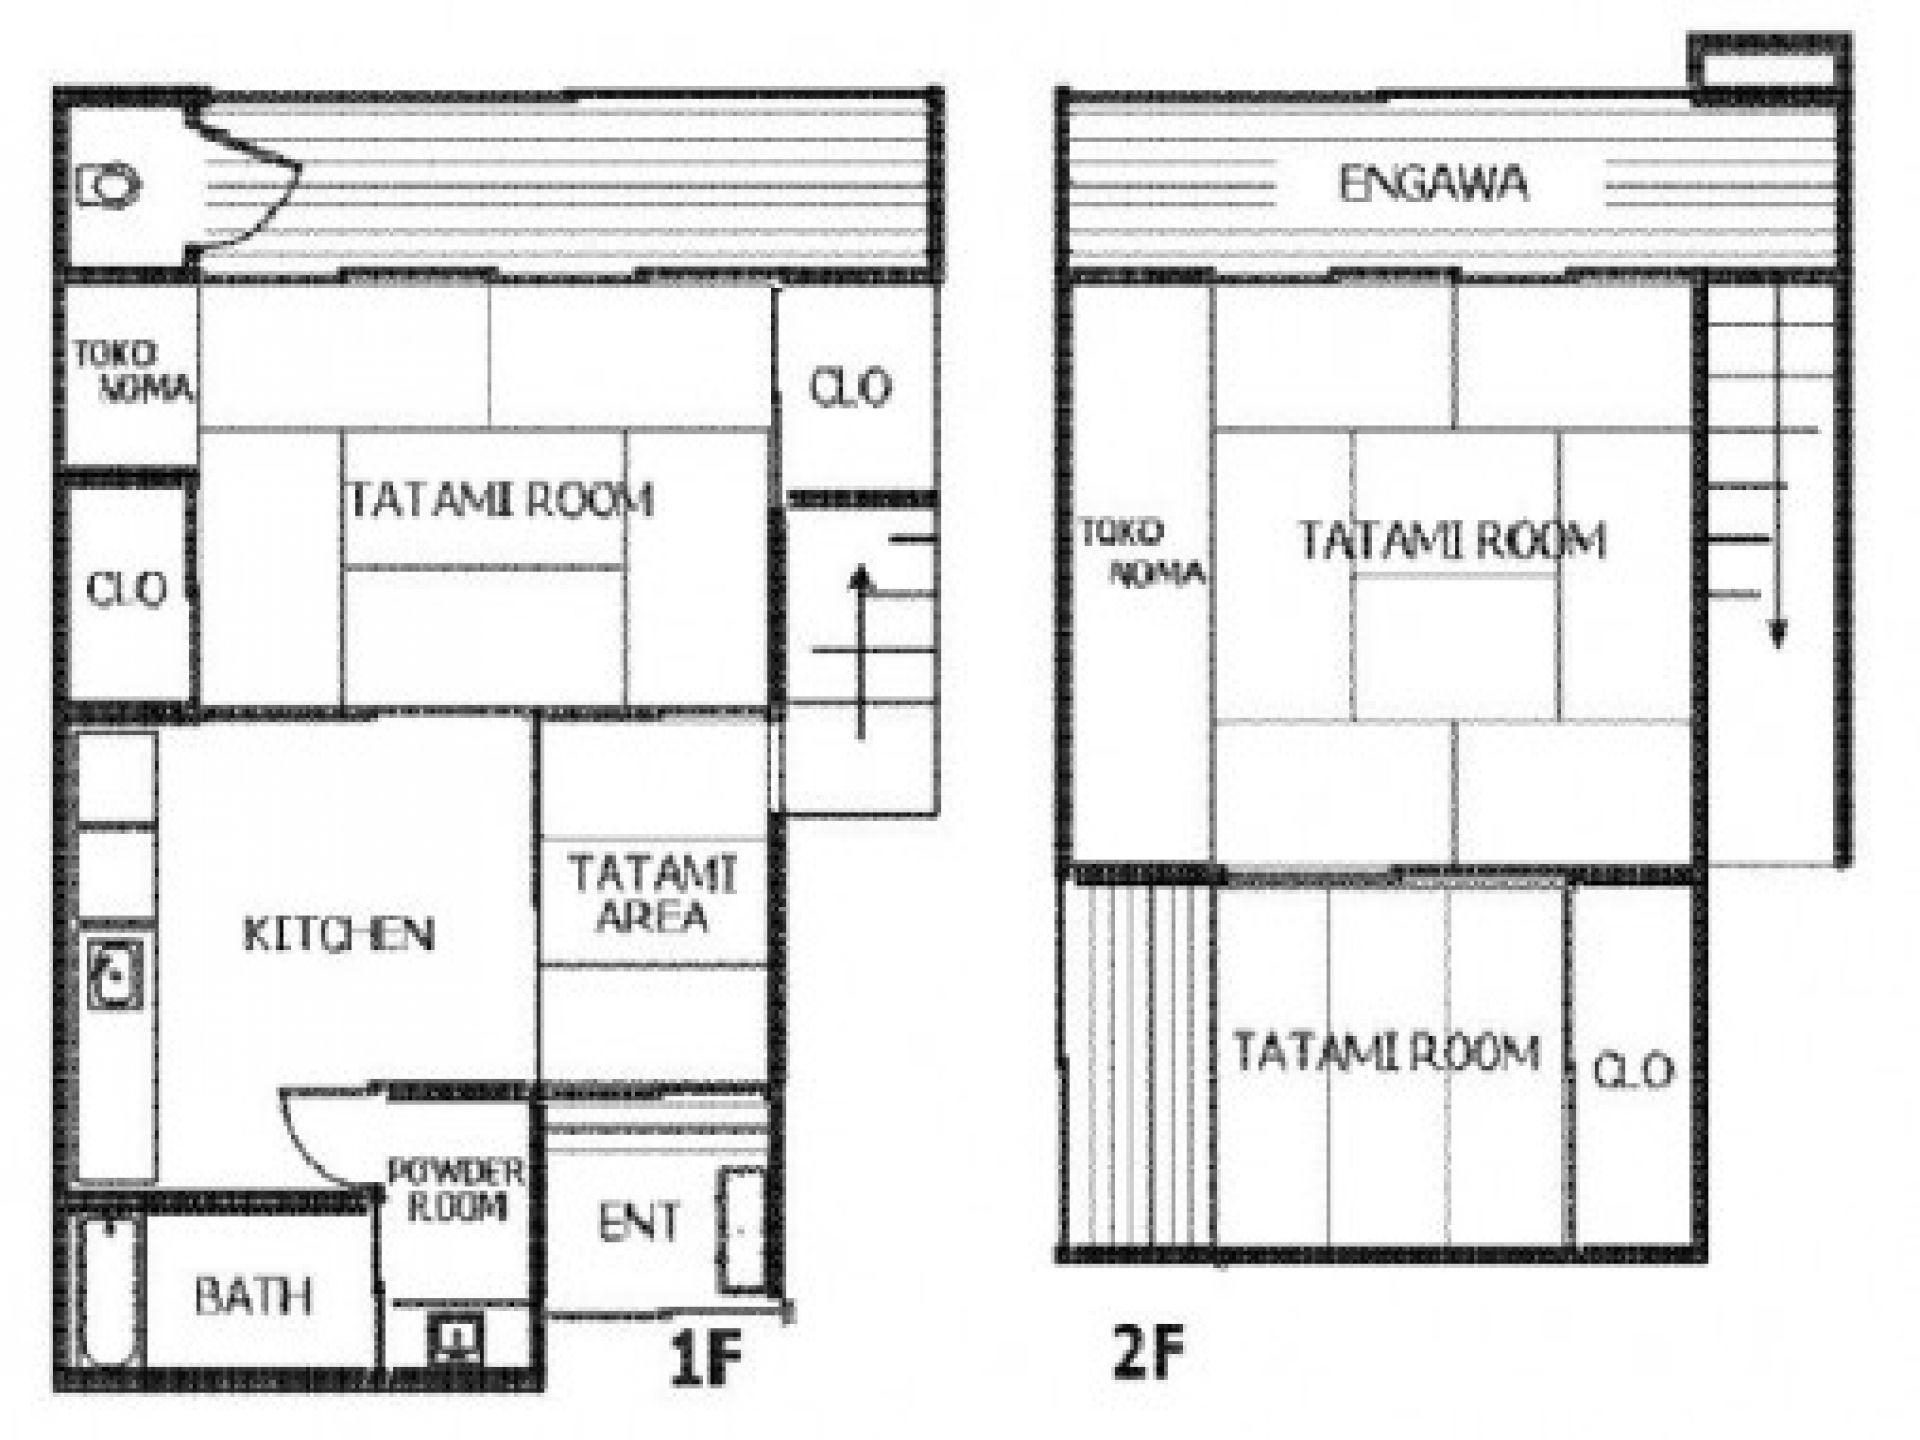 Decorating Modern And Minimalist Japanese Home Design - noqtr ...